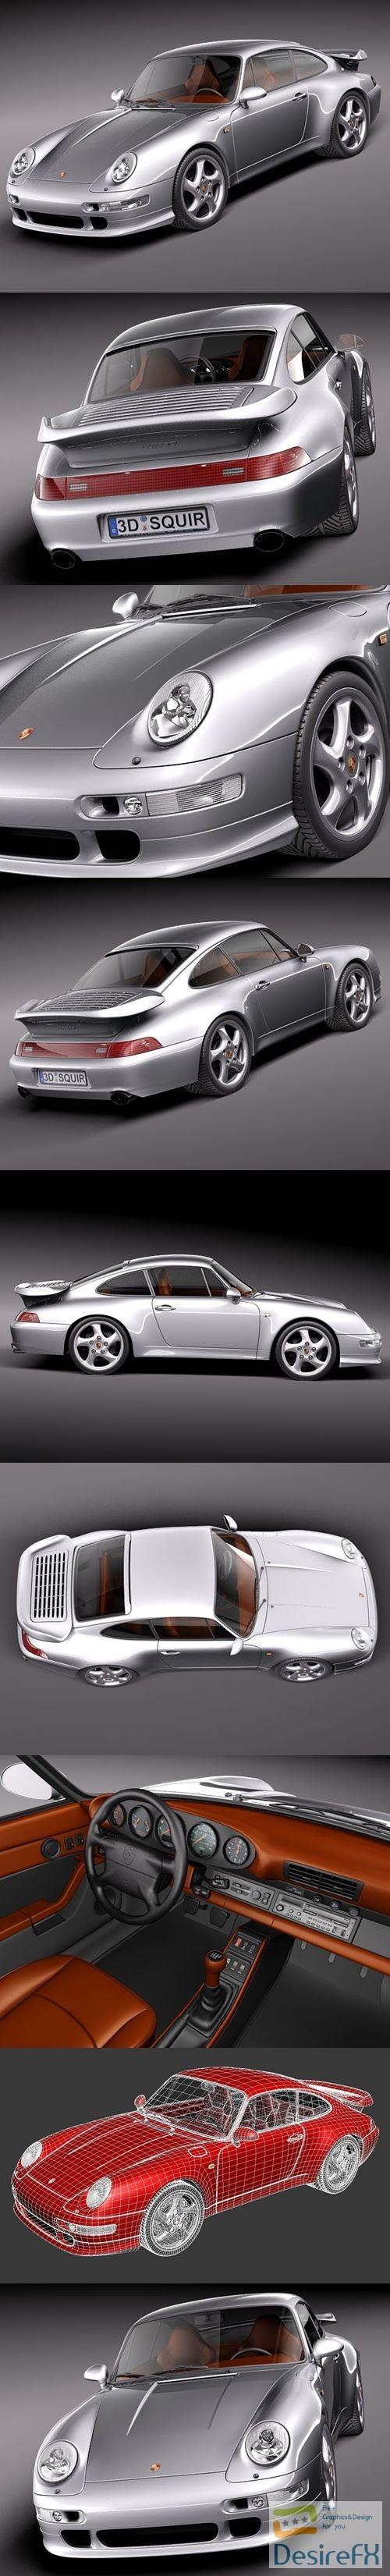 Porsche 911 993 Turbo 3D Model